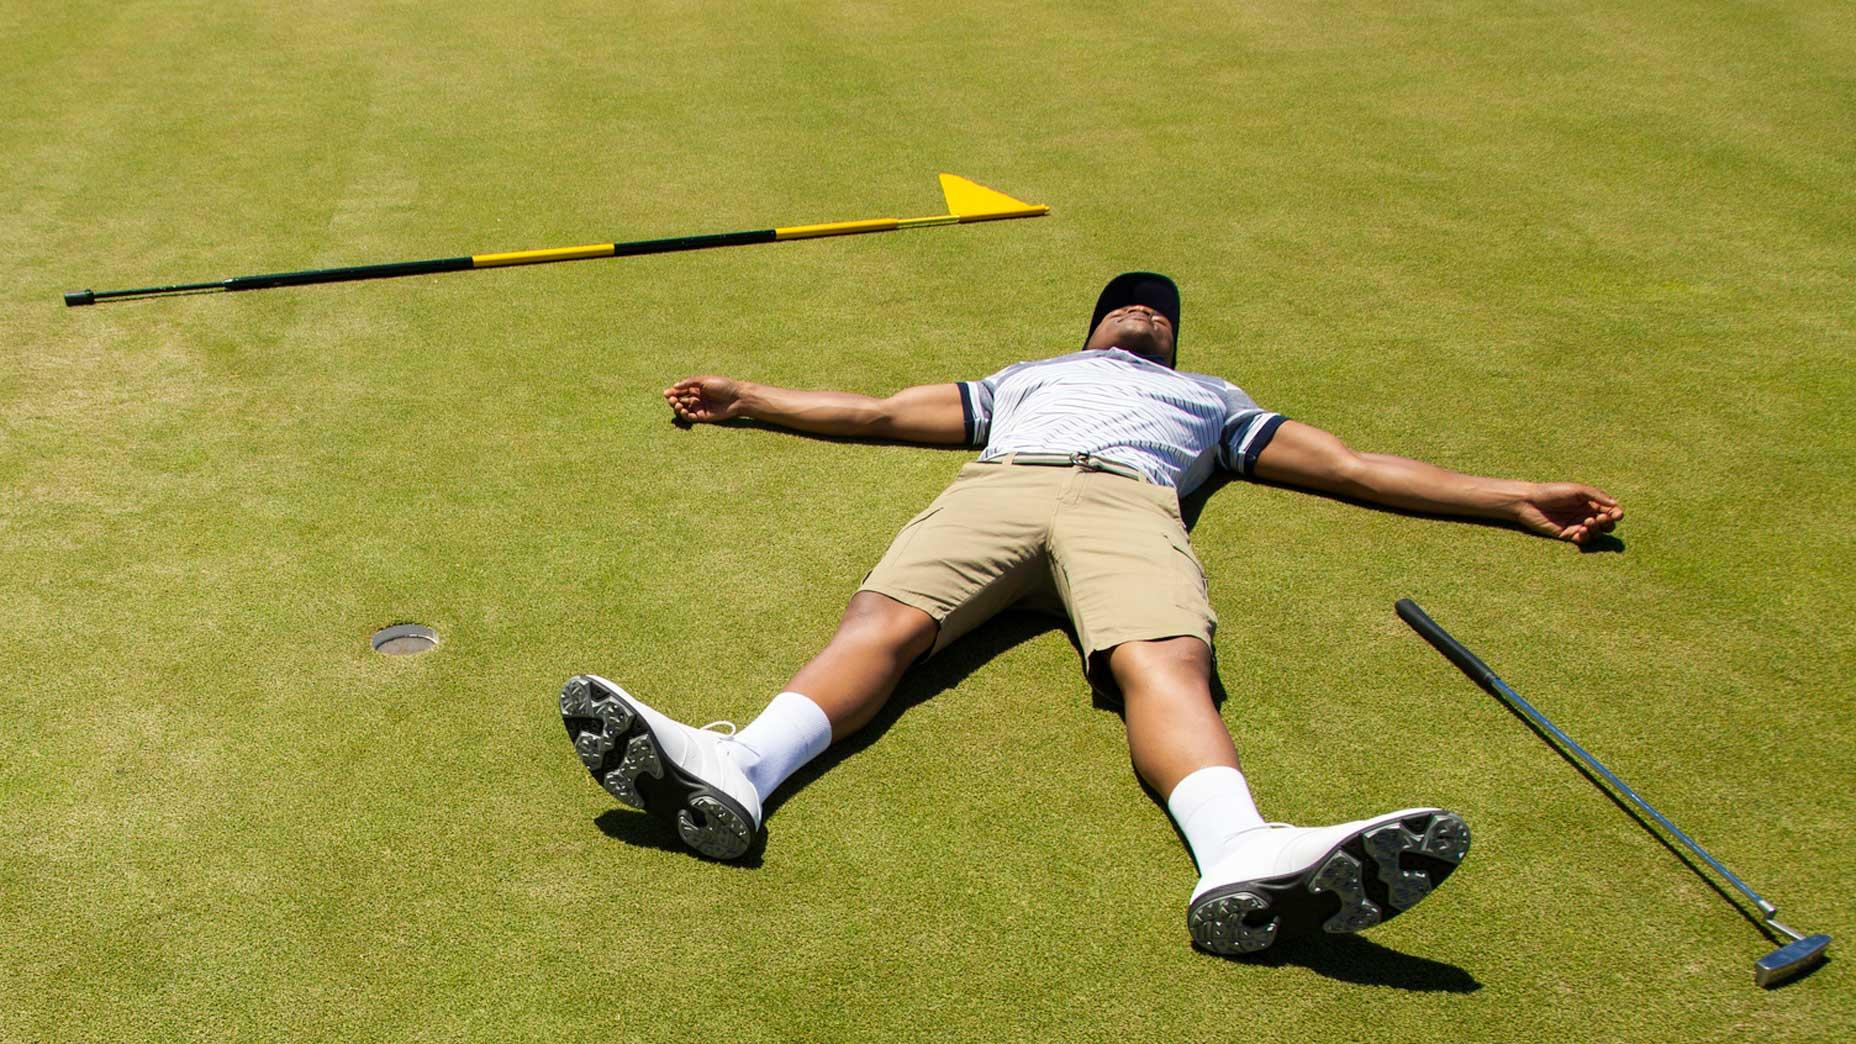 5 common mistakes high handicap golfers make way too often